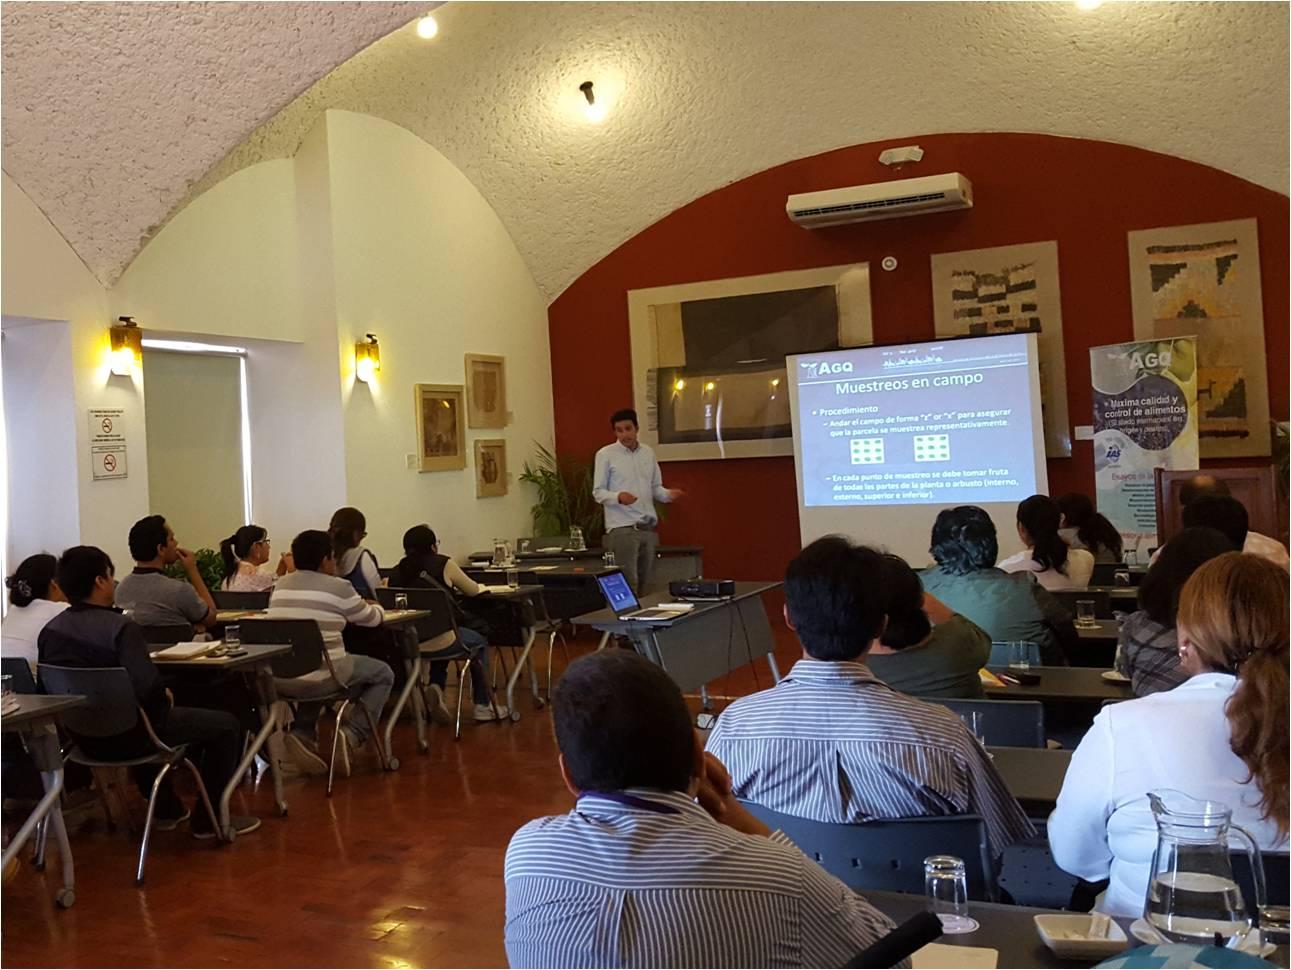 Jornadas técnicas sobre la Ley FSMA organizadas por AGQ Labs Perú